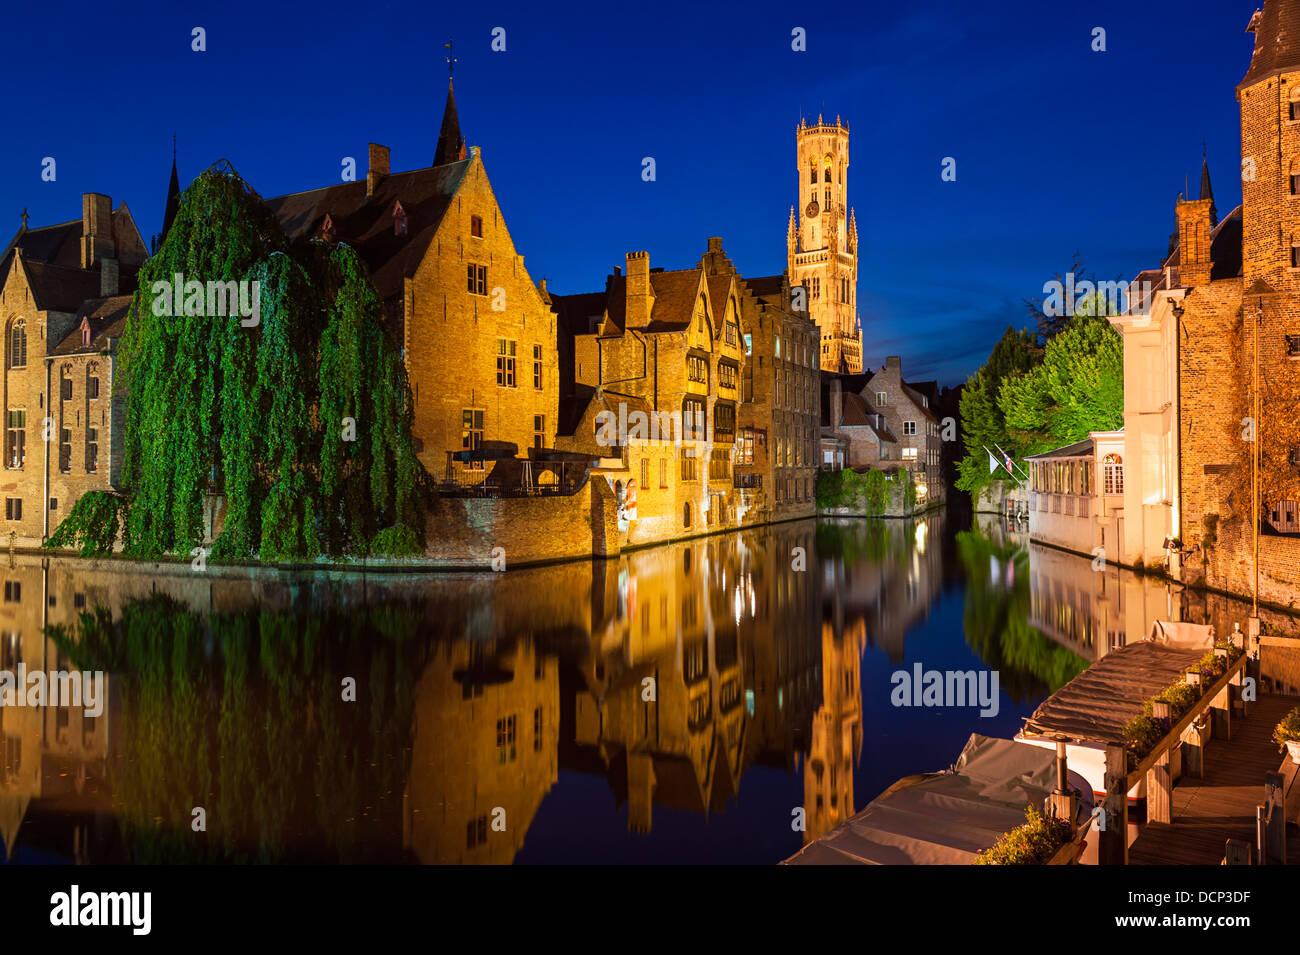 Rozenhoedkaai Bruges Belgio Foto Stock